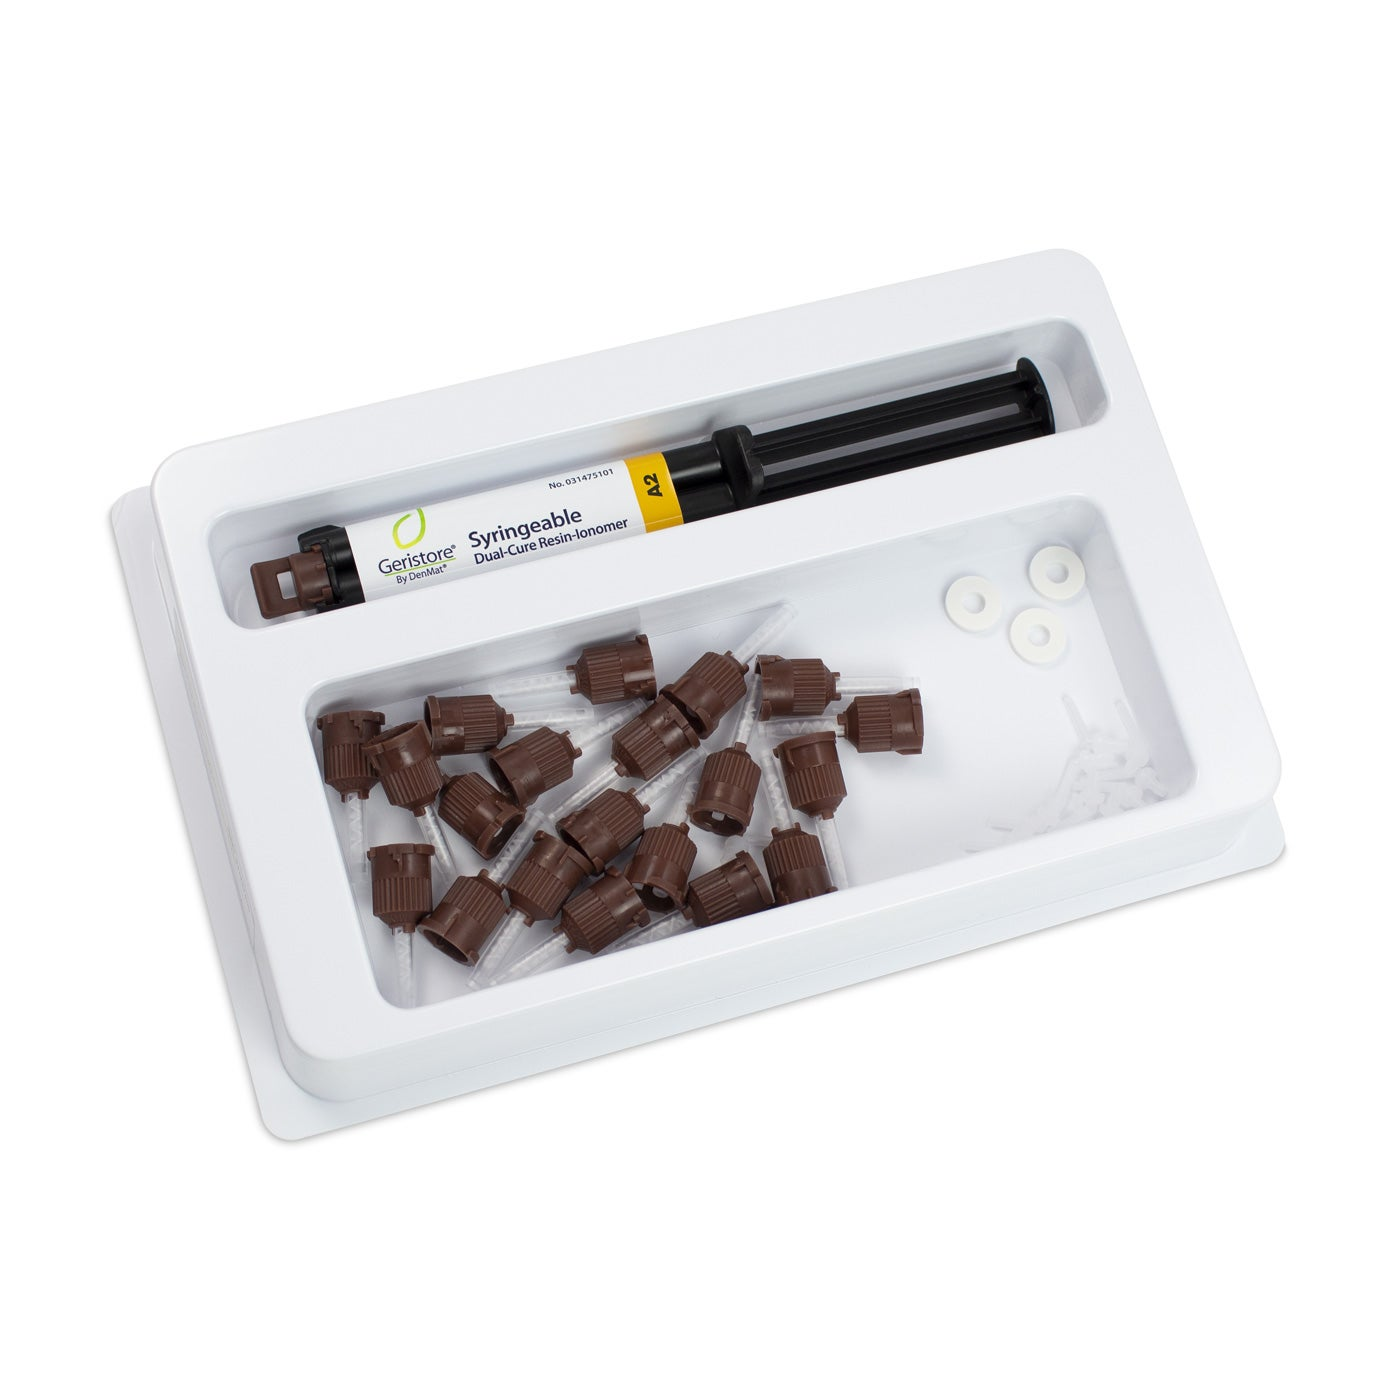 Dental Resin-Ionomer - Geristore Syringeable Kit A2